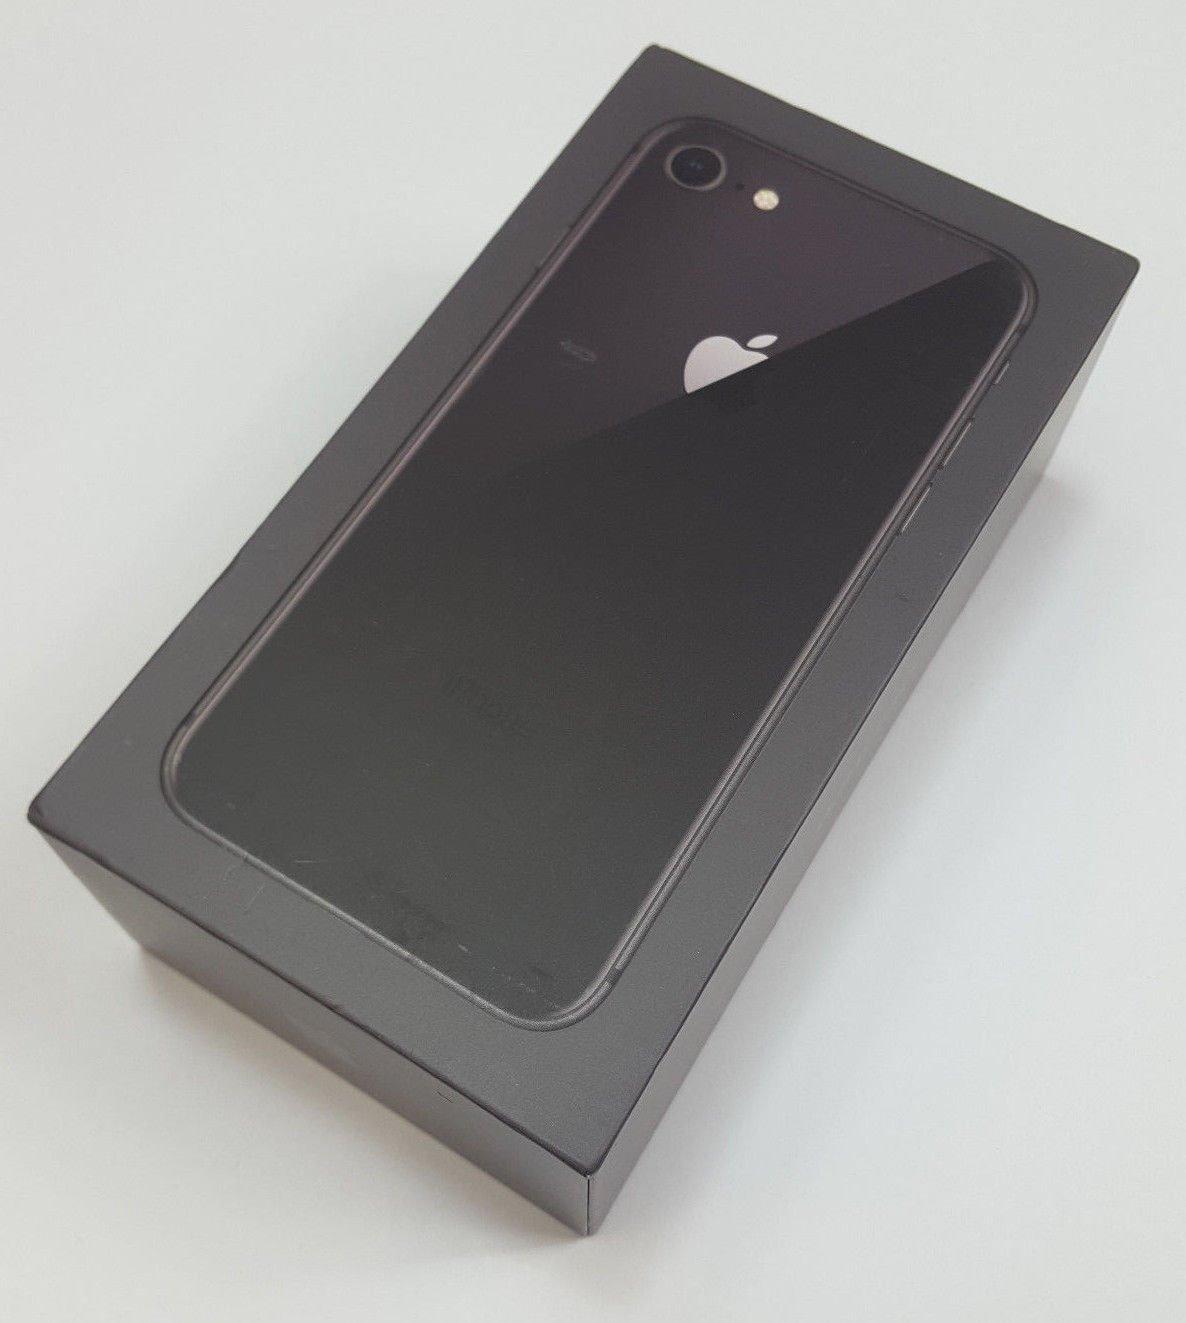 Apple iPhone 8 Grey Prázdný Box